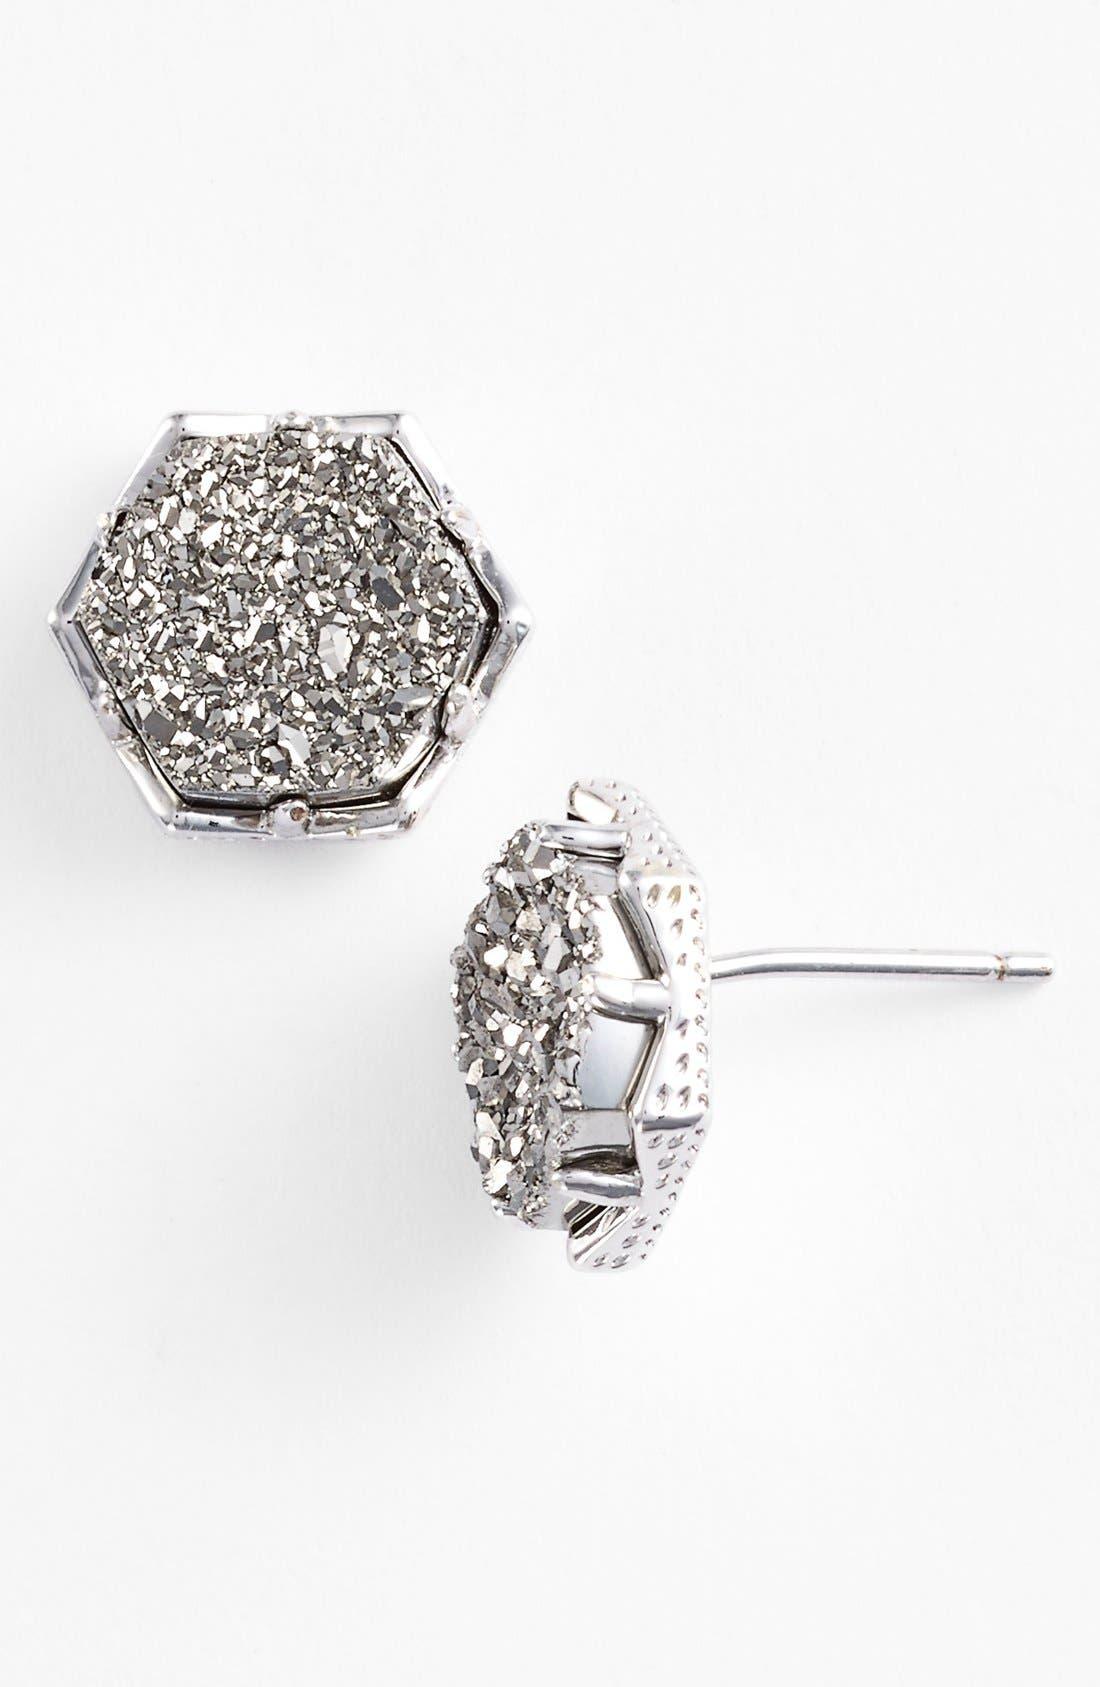 Main Image - Kendra Scott 'Macy' Stud Earrings